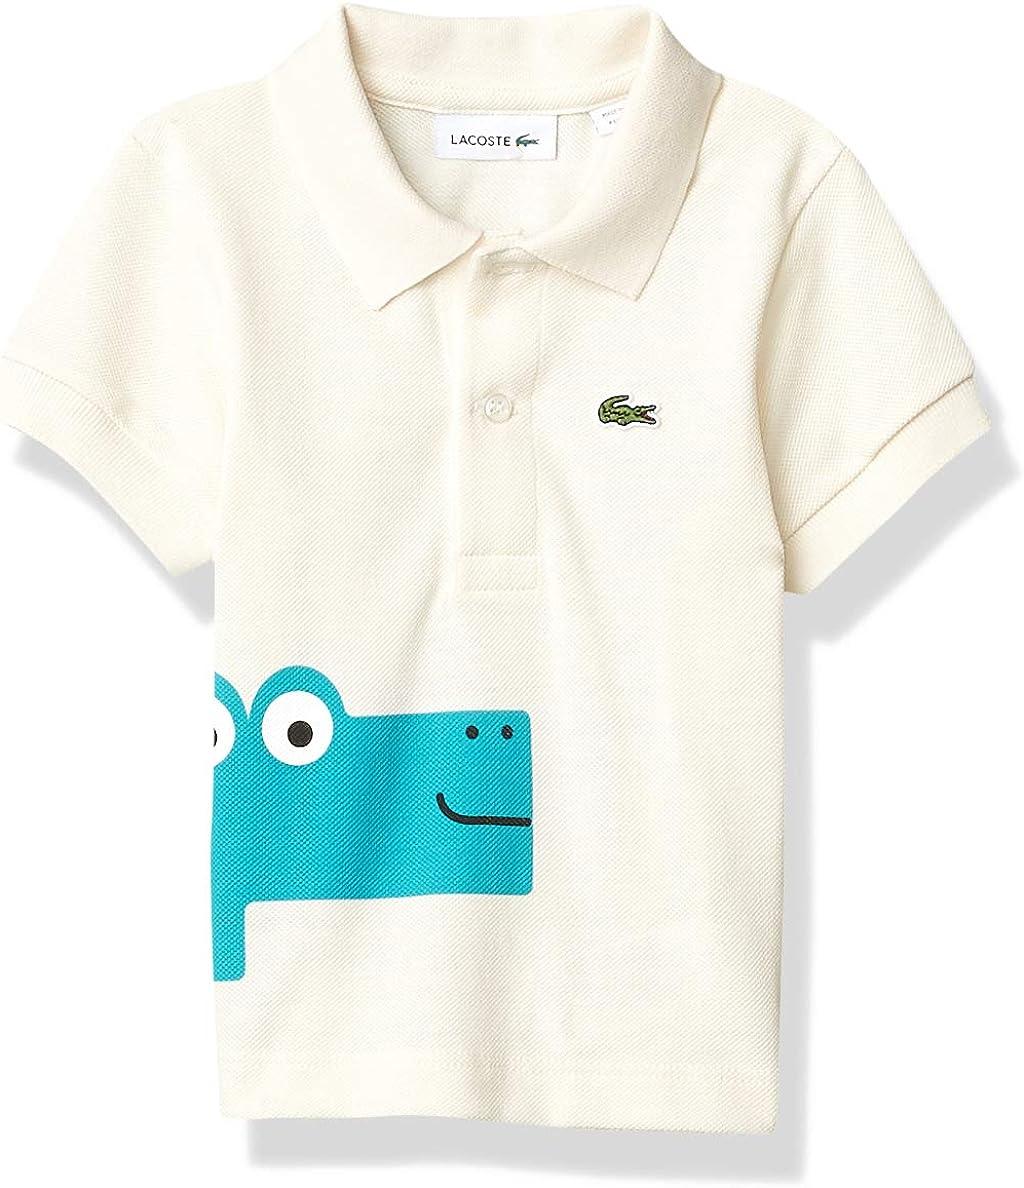 Lacoste Boys' Graphic Croc Pique Polo Shirt